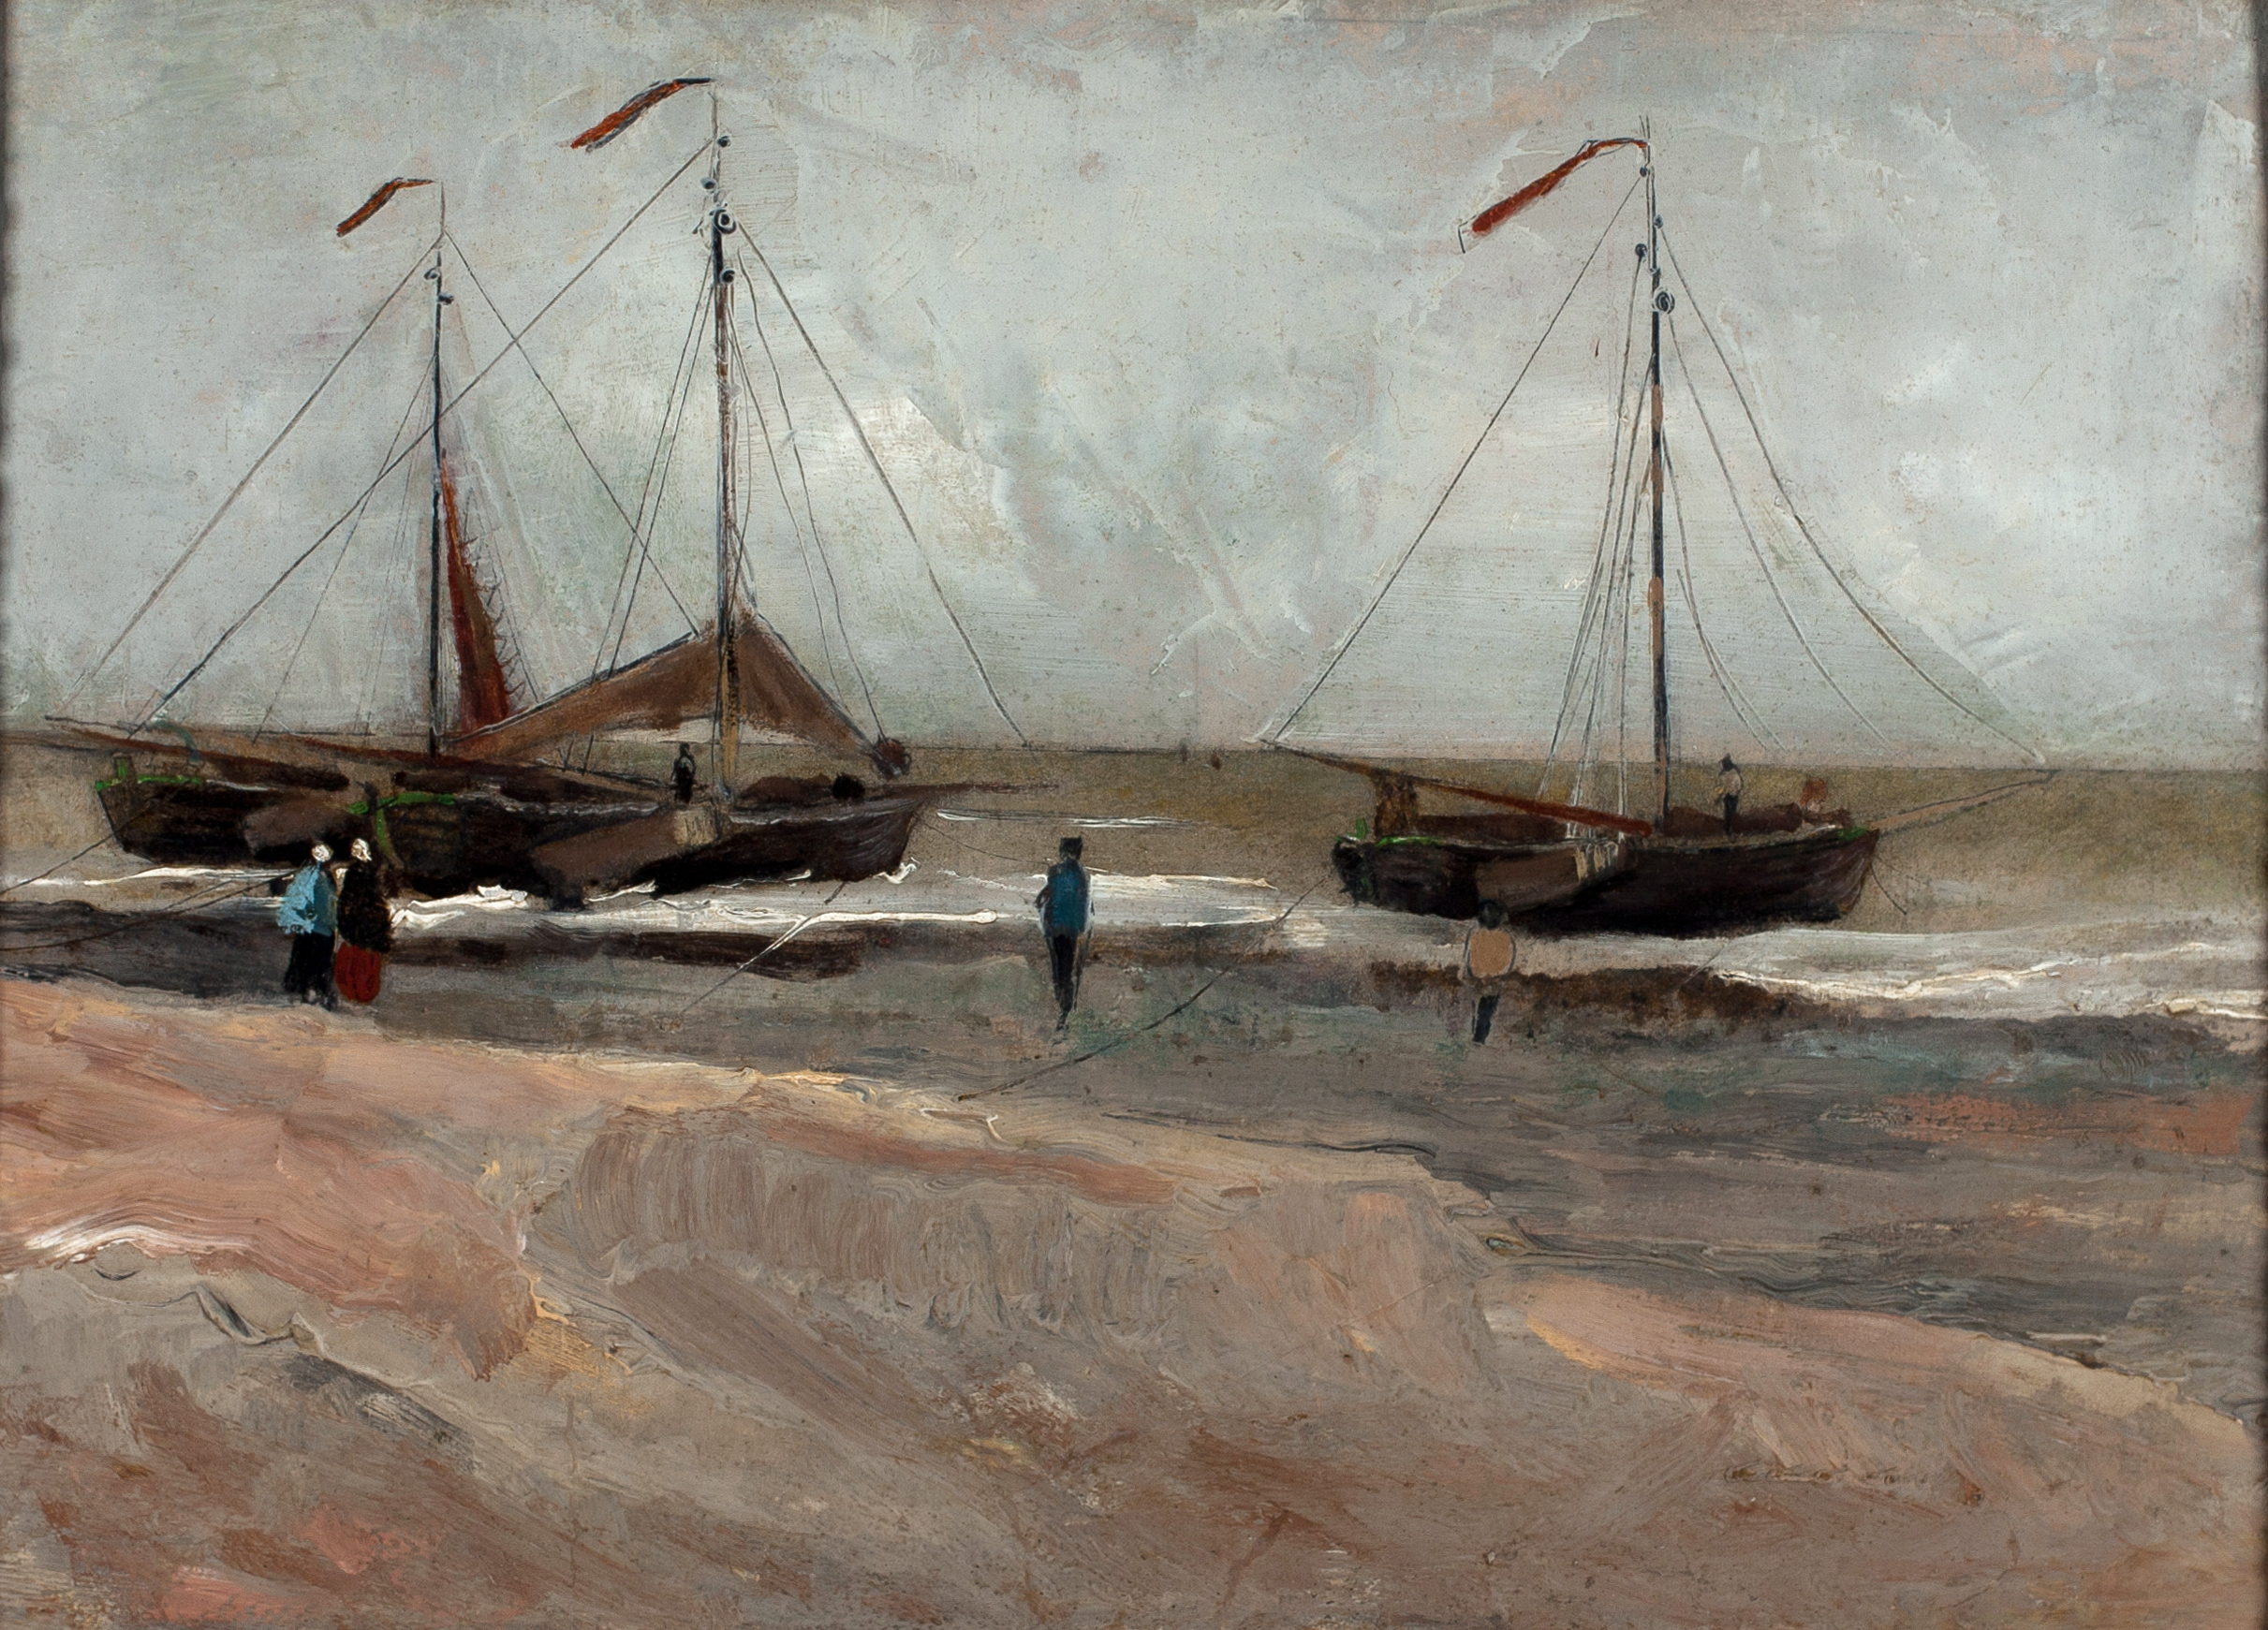 Vincent Van Gogh,  The Beach of Scheveningen,  1882. Oil on paper on panel. Minnesota Marine Art Museum.